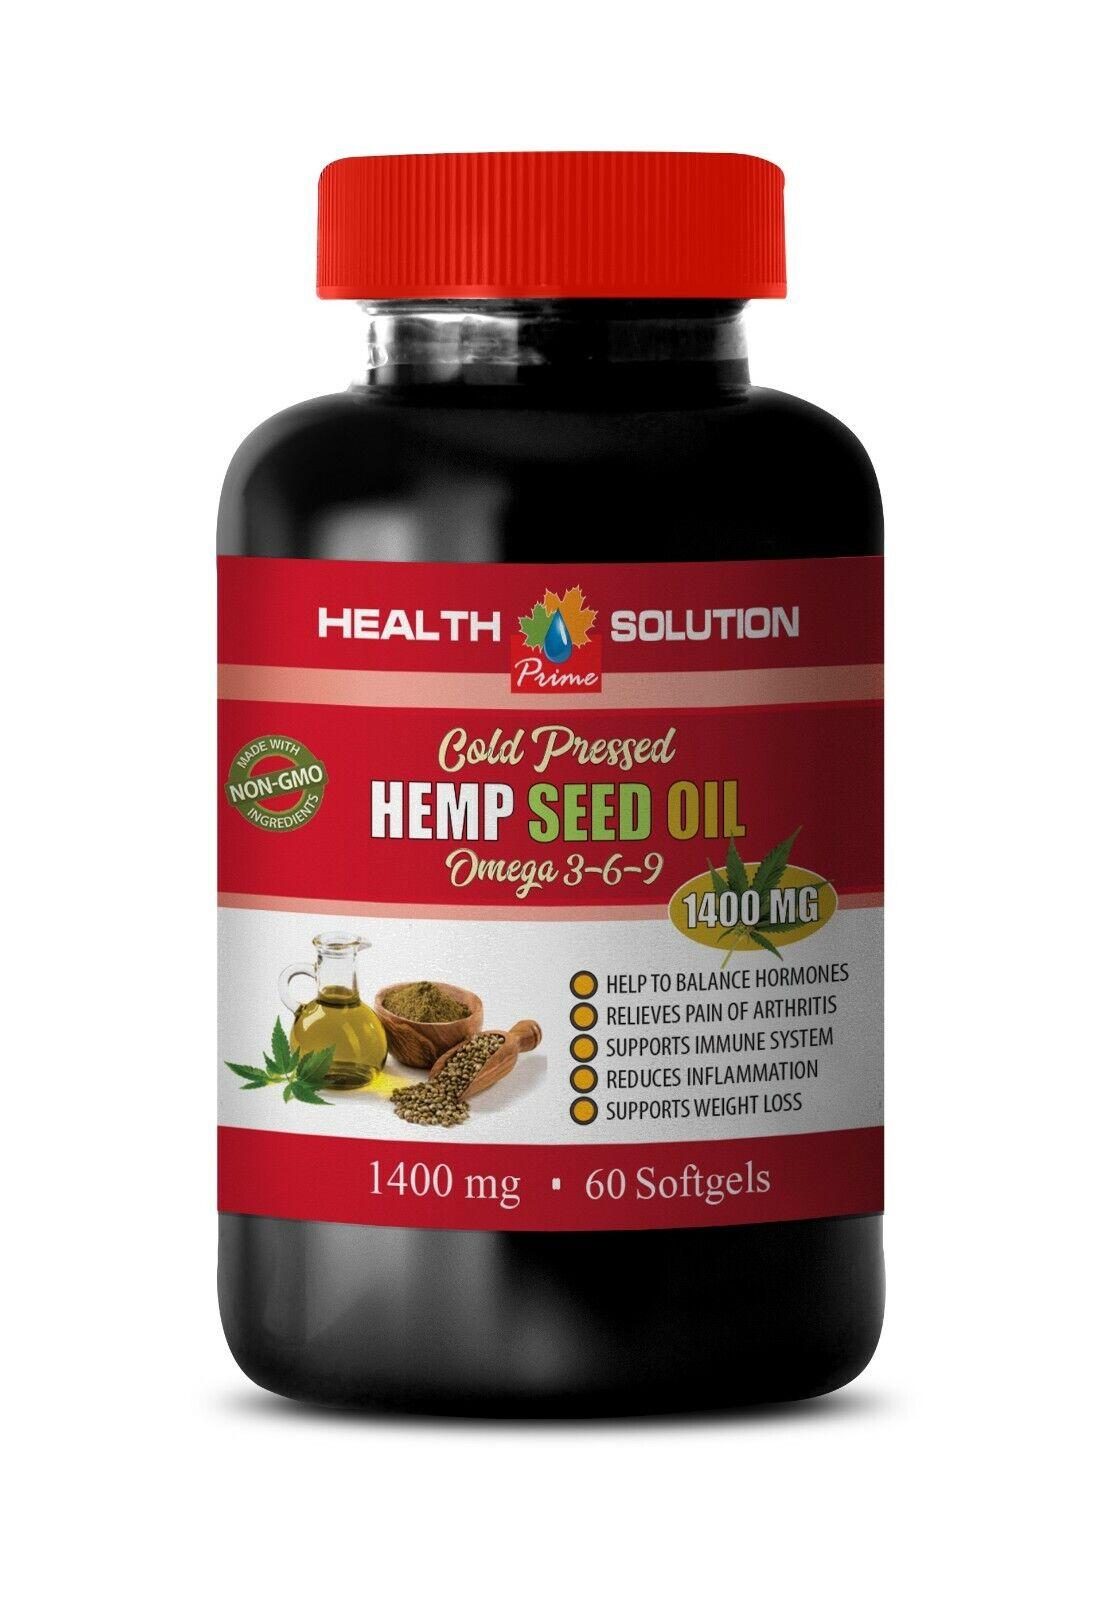 hemp oil for pain relief - ORGANIC HEMP SEED OIL 1400MG 1B- pain relief